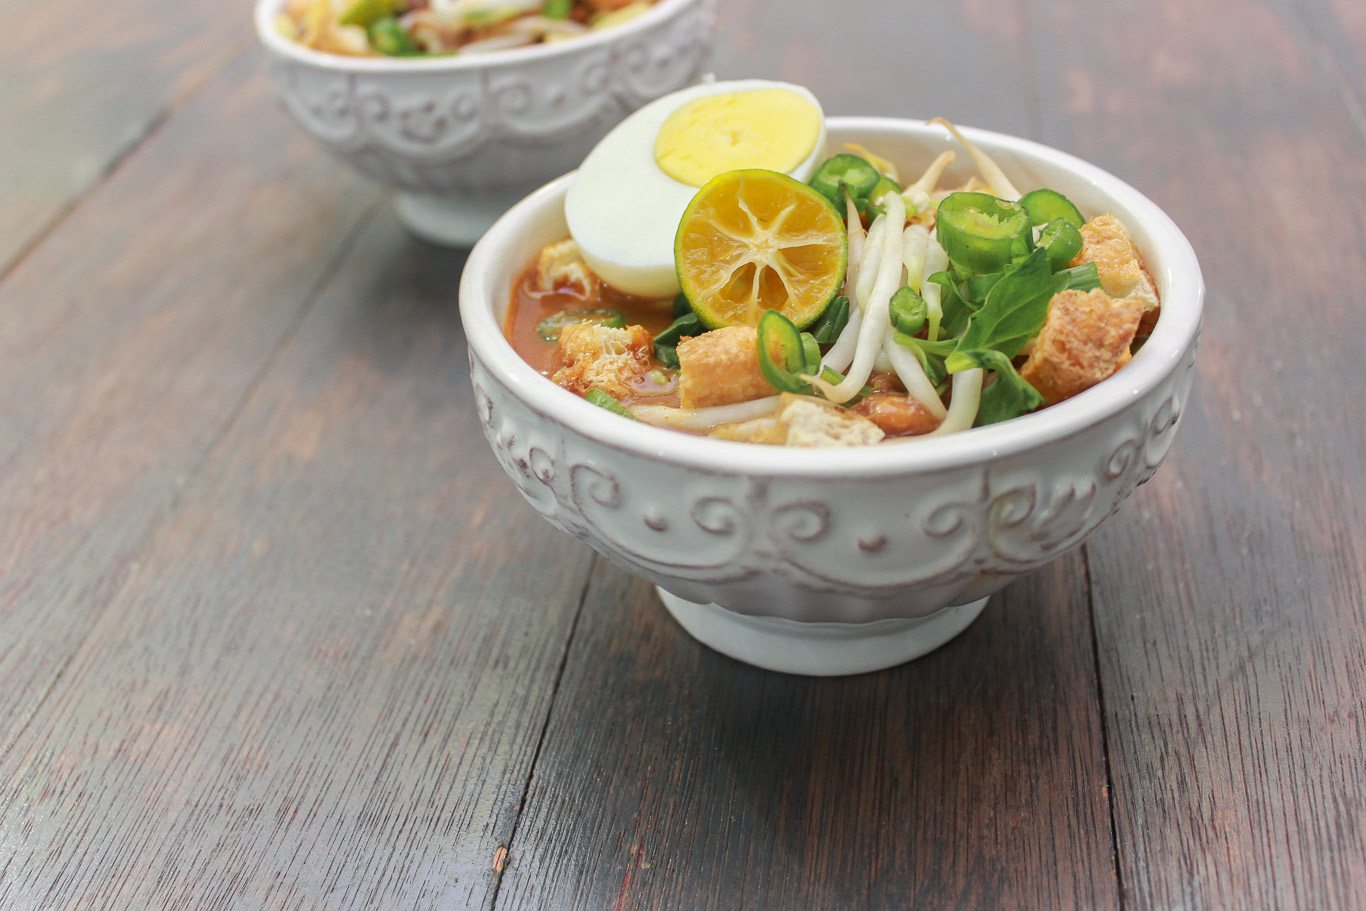 Mee Rebus – Noodles in Sweet Potato Gravy